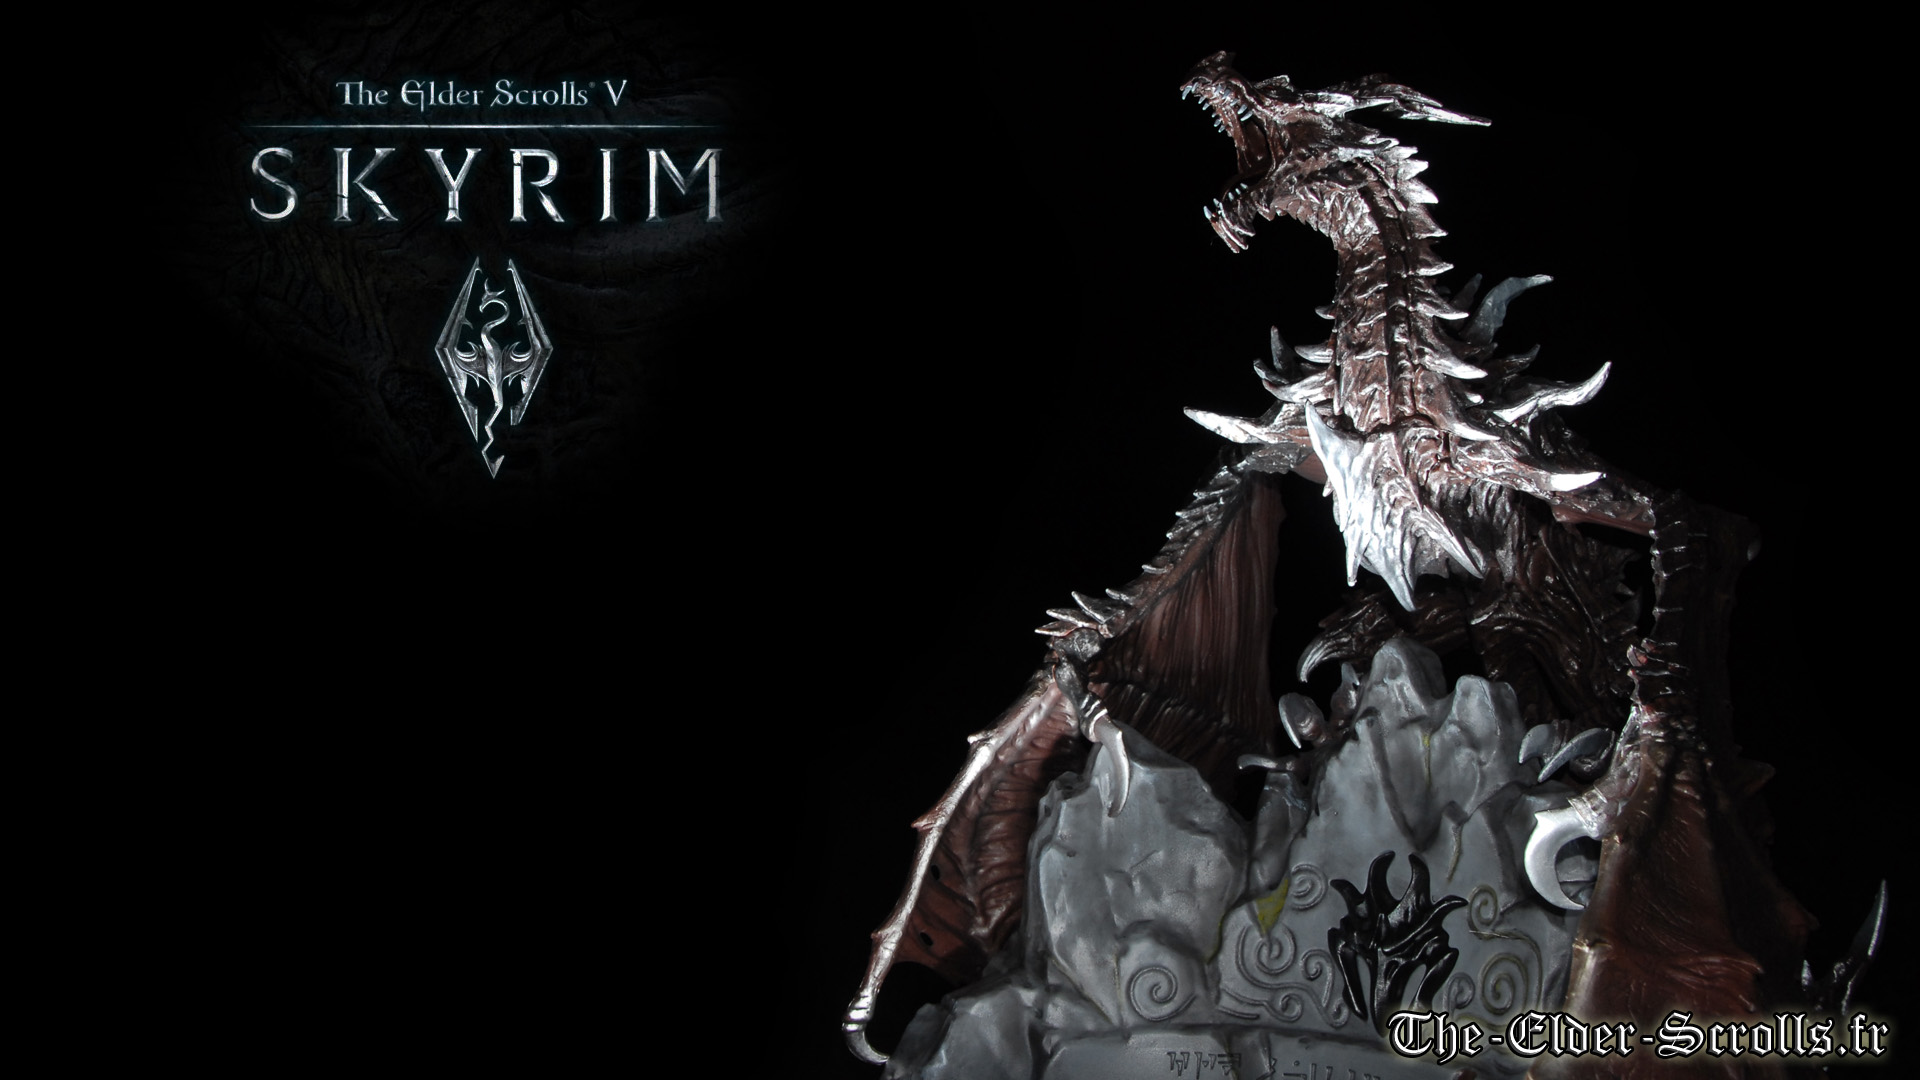 Elder Scrolls Skyrim Wallpapers High Quality Download Free